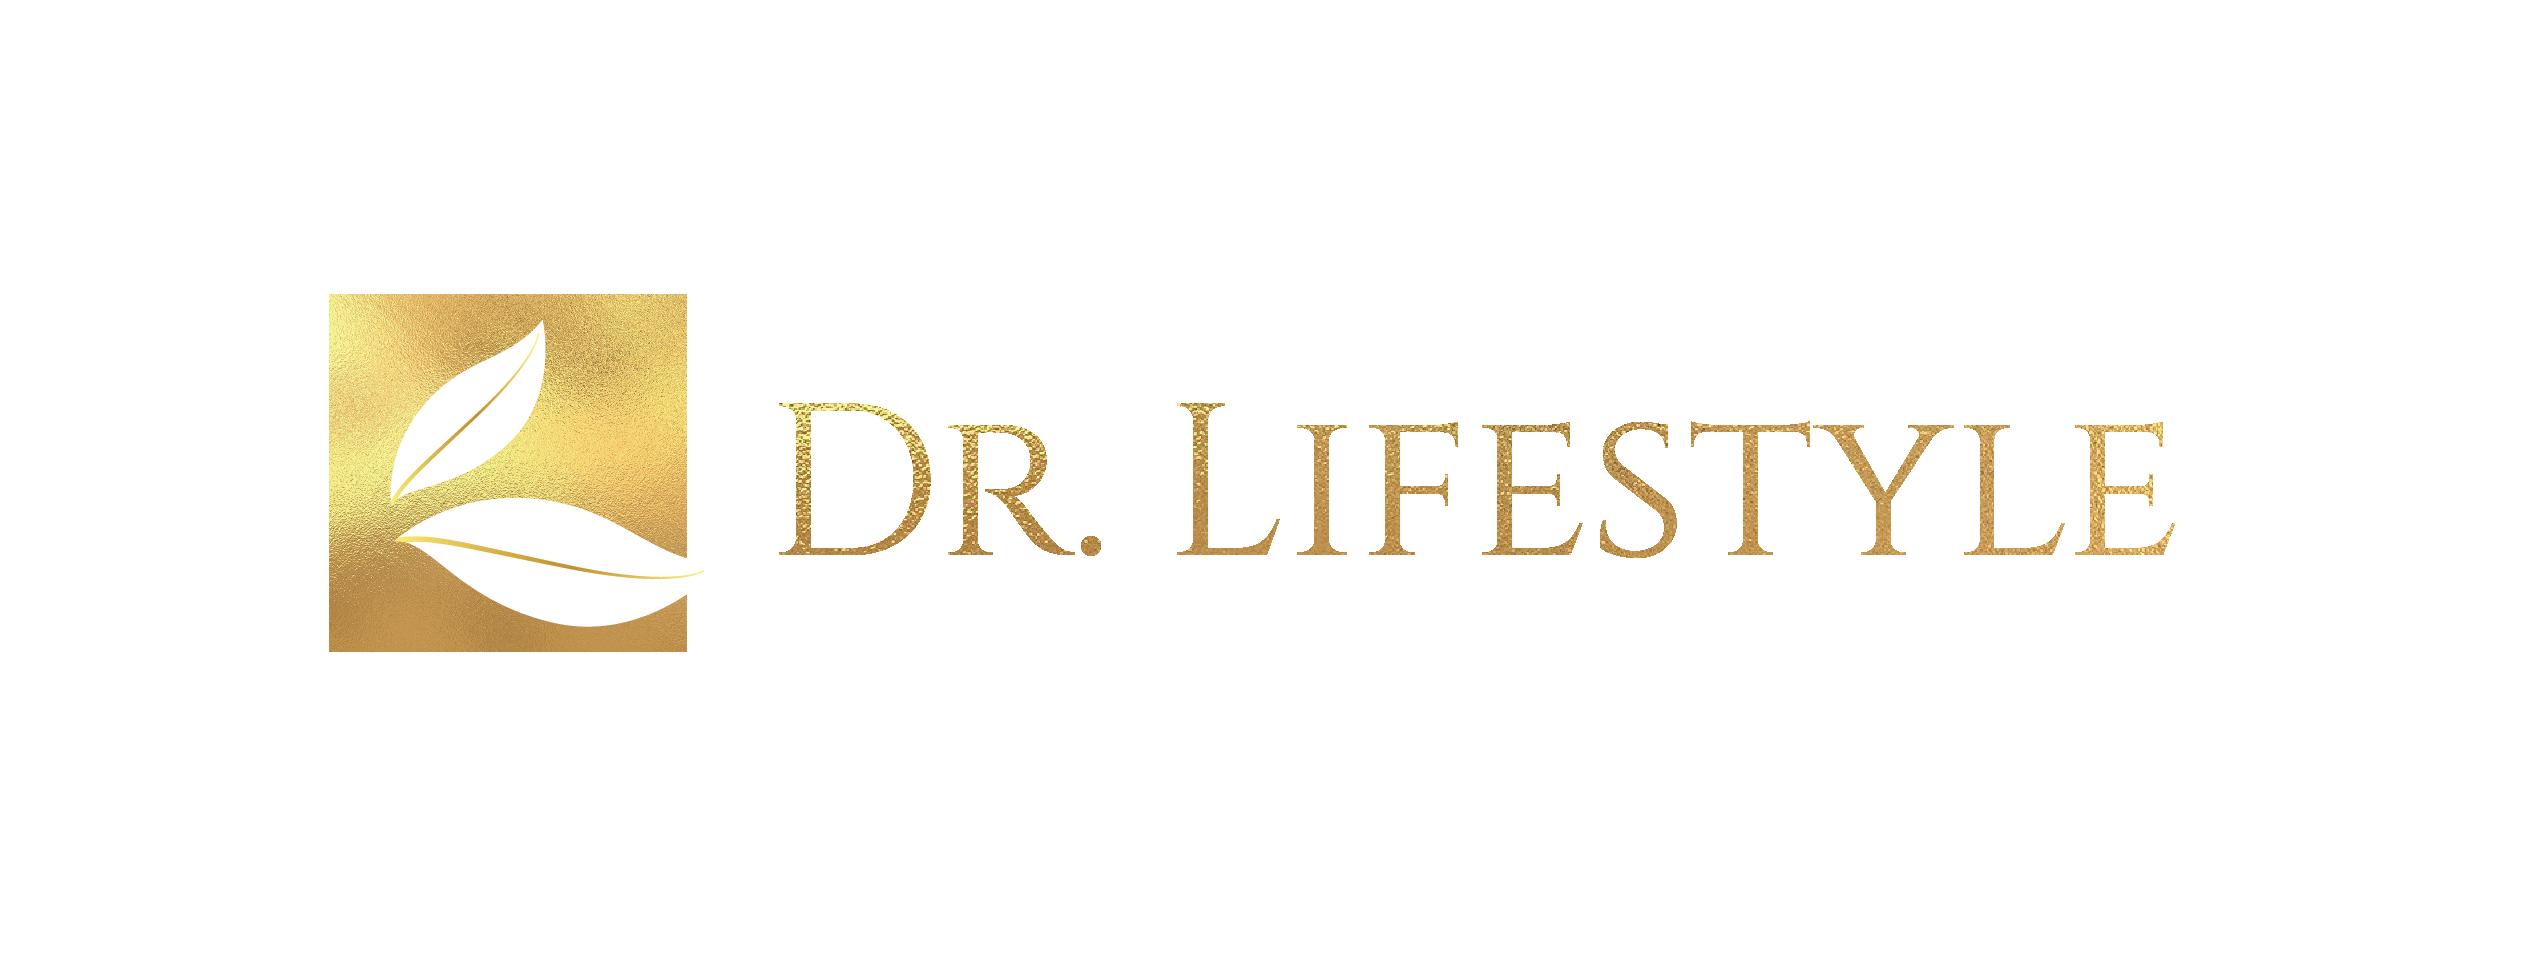 Dr. Lifestyle